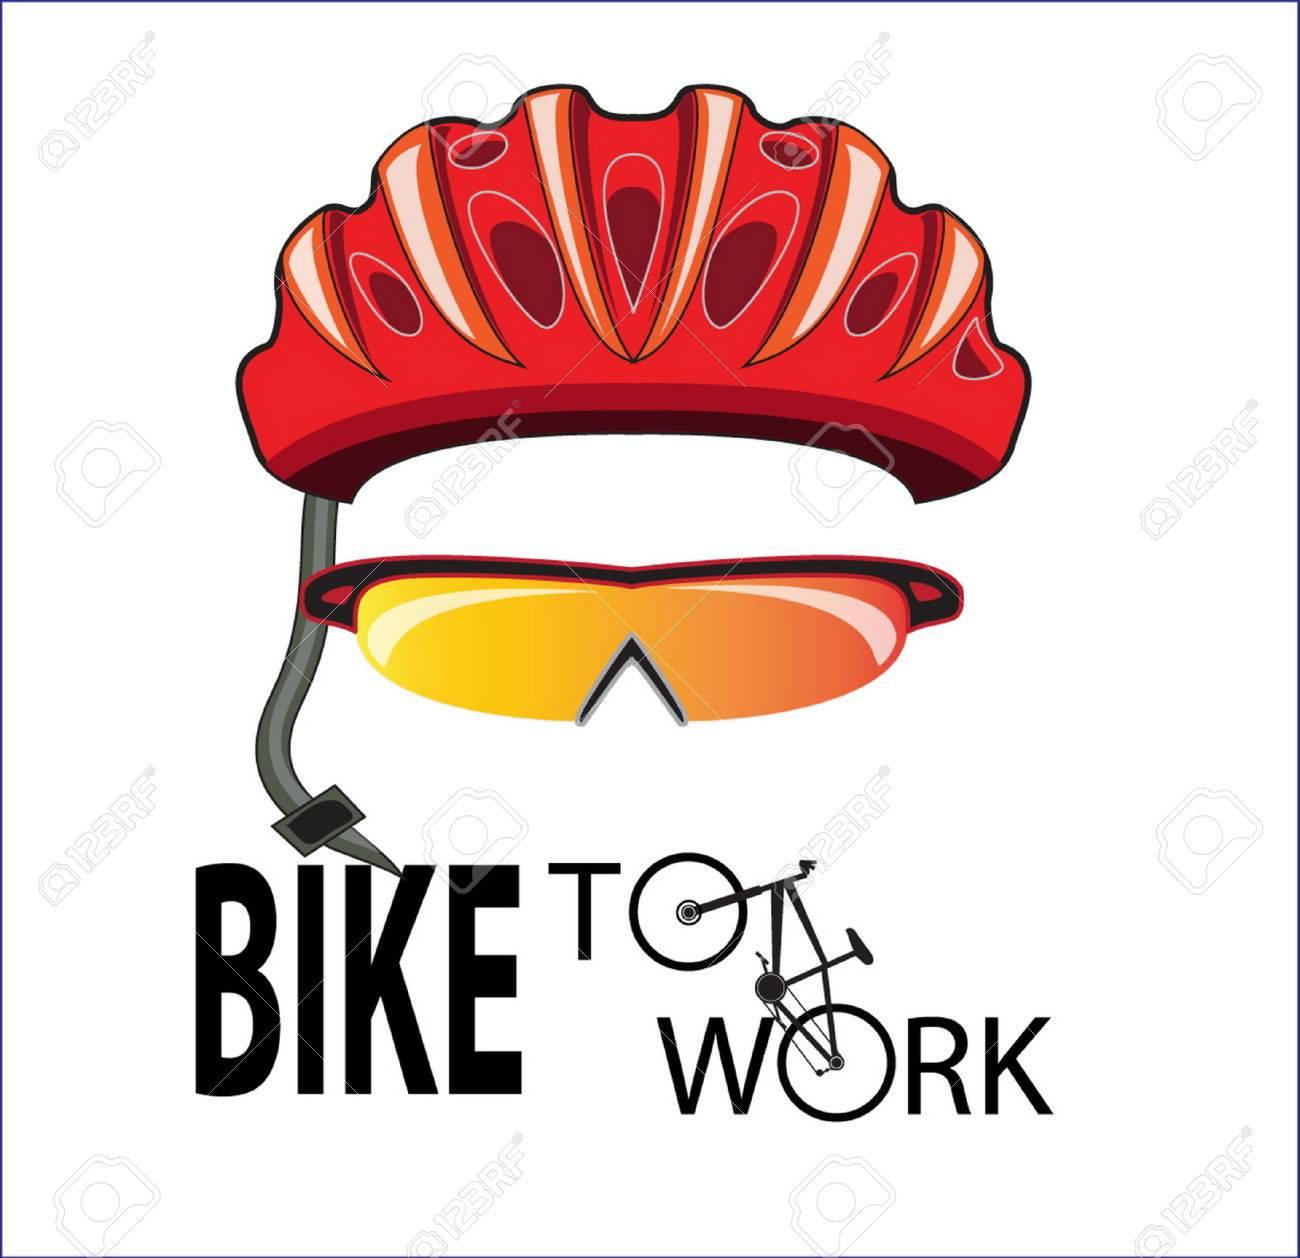 bicycle helmet and sun glasses bike to work - 35027090